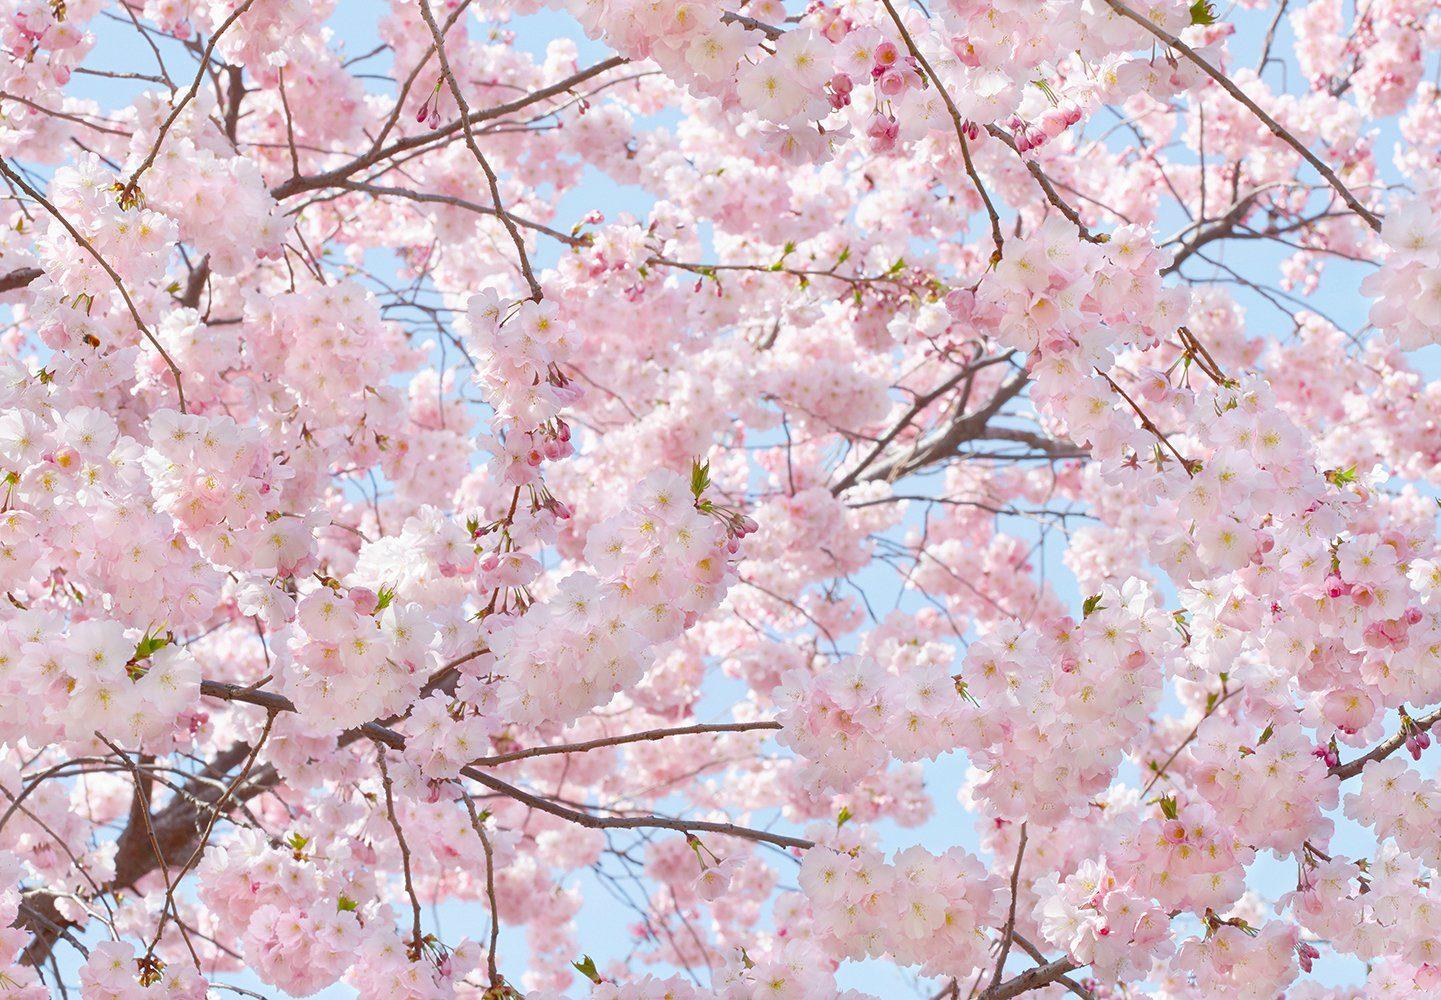 Fototapete »Pink Blossoms«, 8-teilig, 366x254 cm